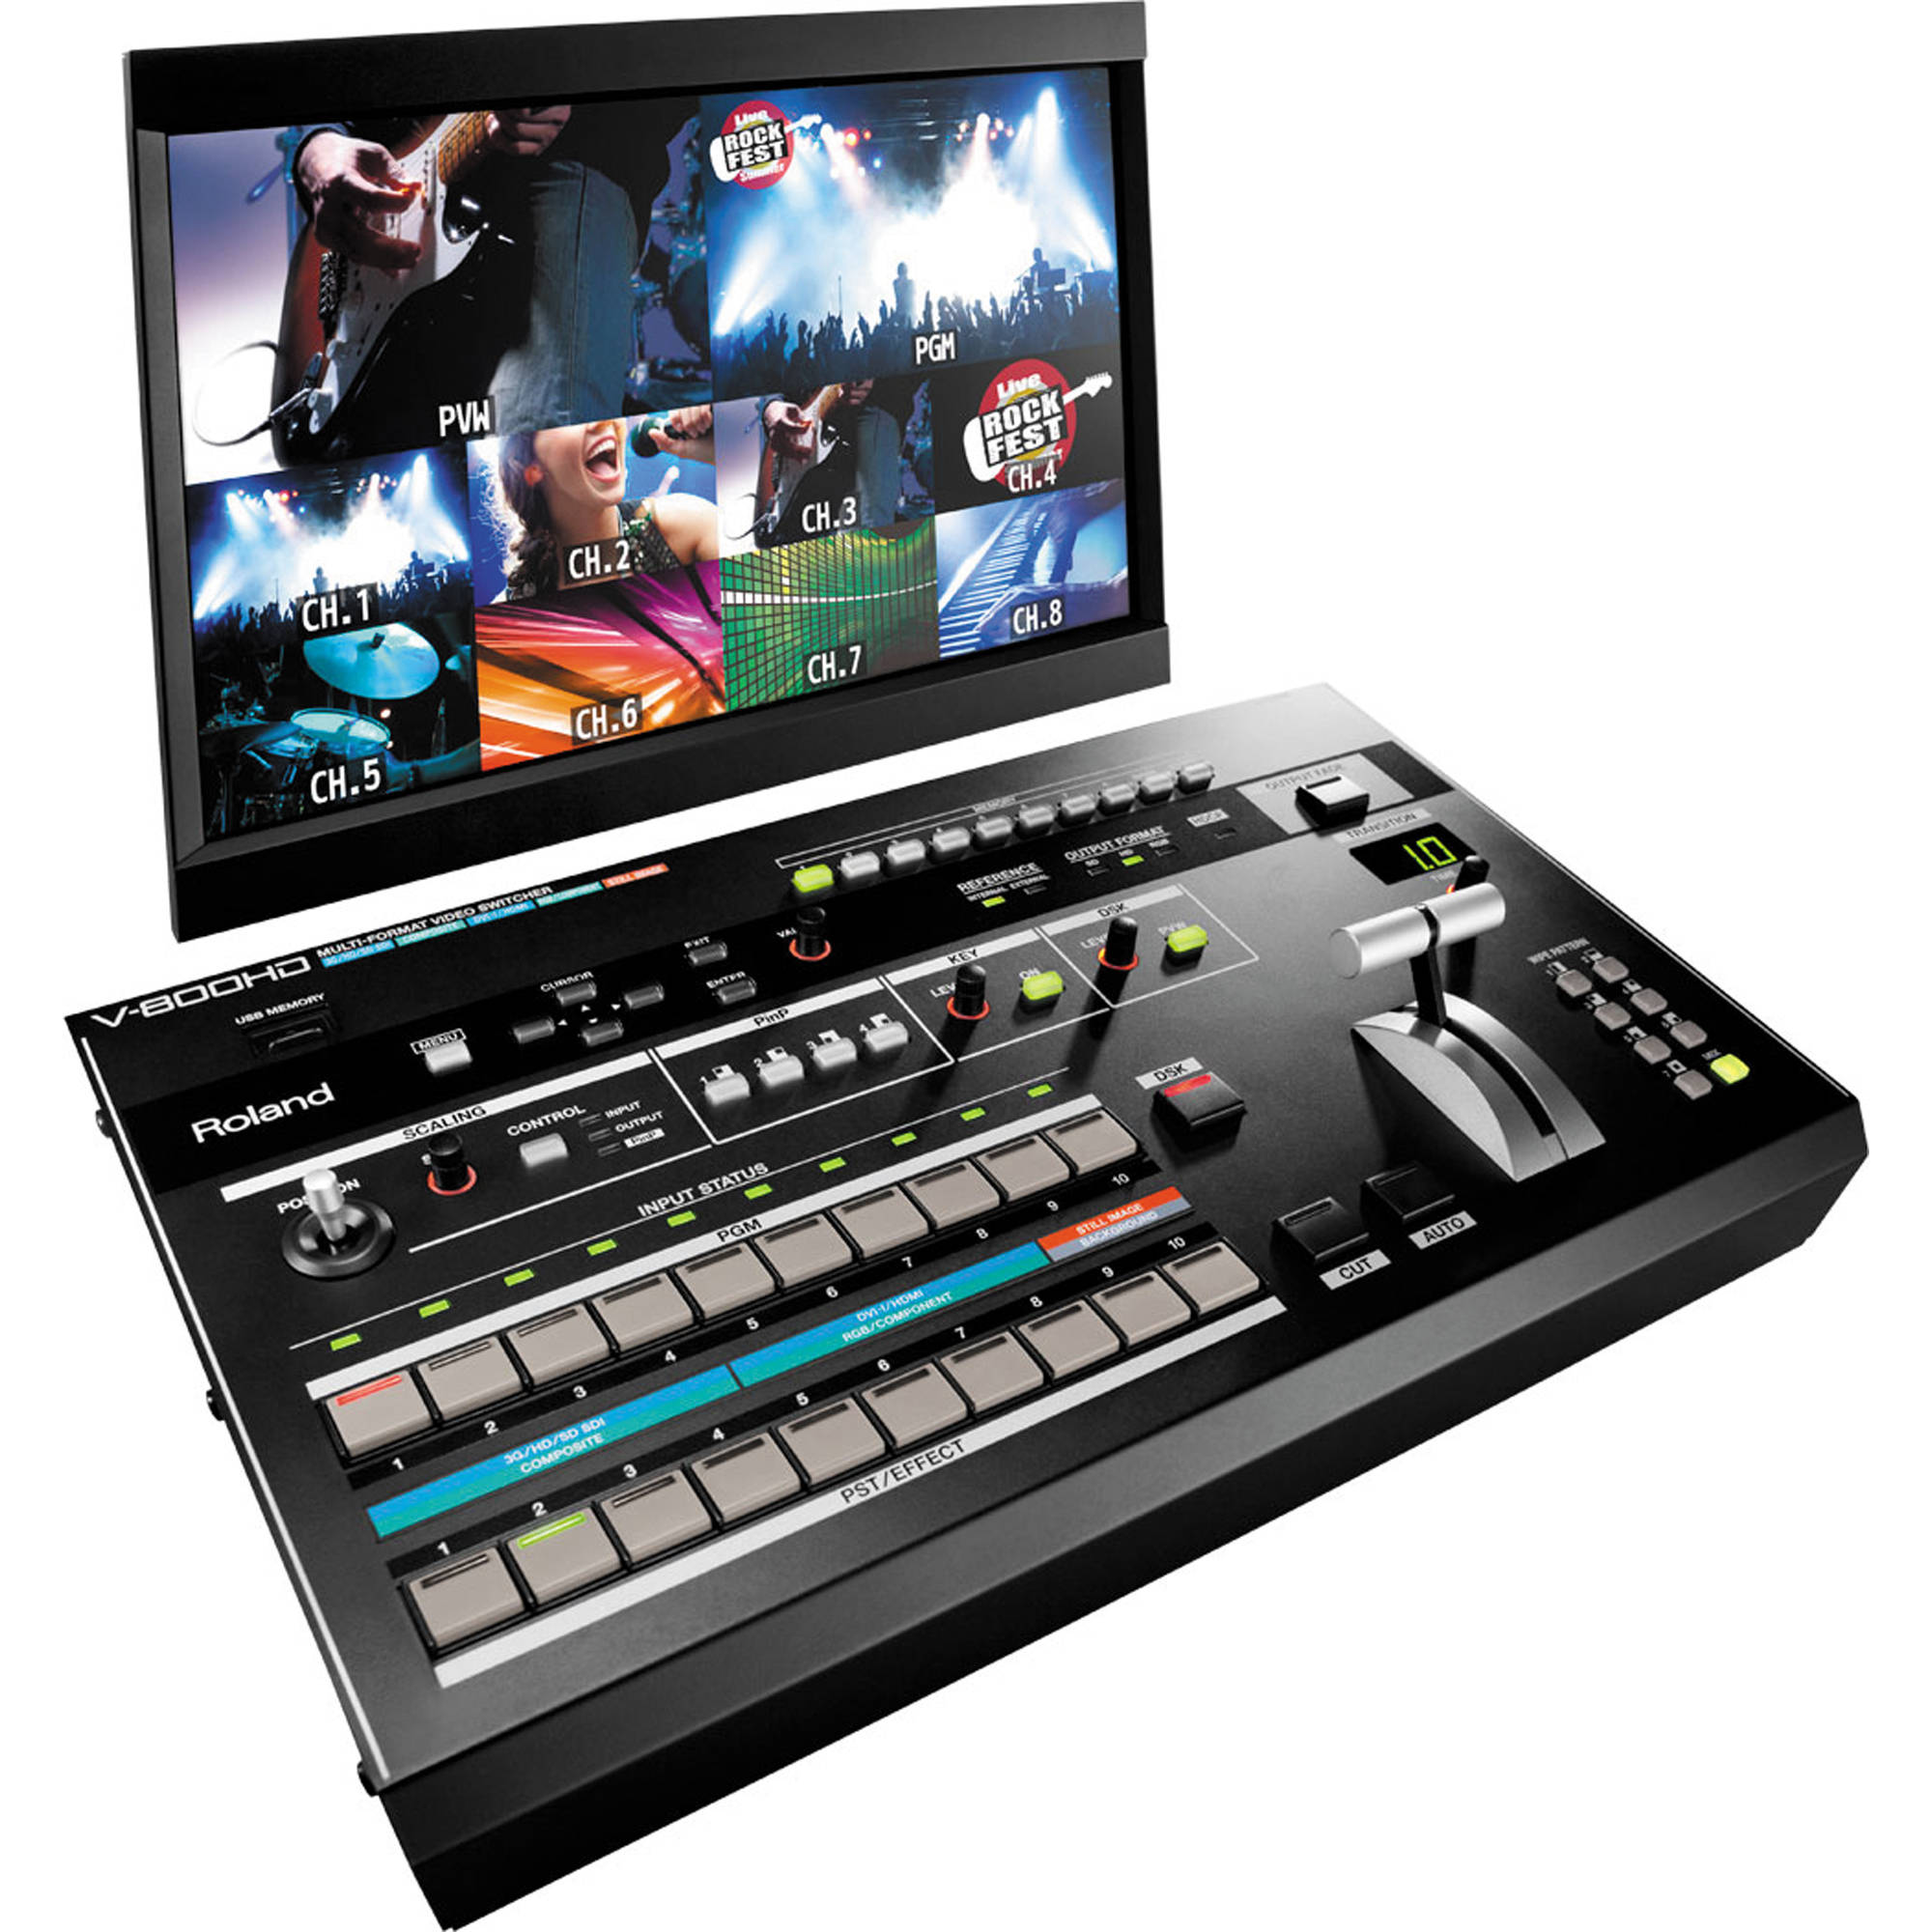 Roland V 800hd Multi Format Video Switcher Bh Photo Rbvhda8 3g Hd Sdsdi 1 Input 8 Output Distribution Amplifier